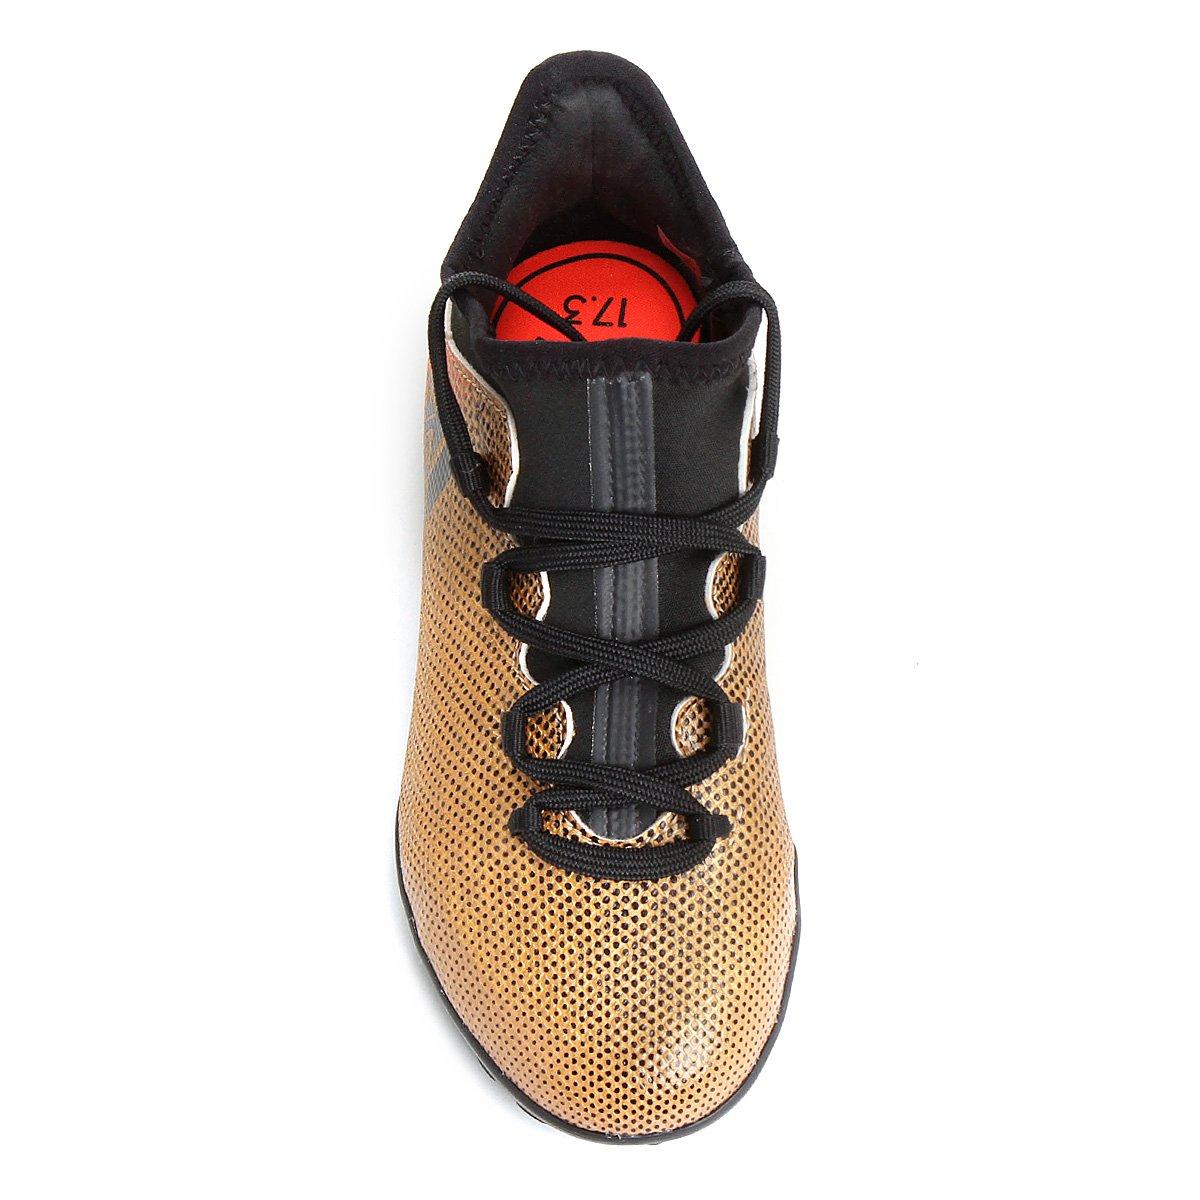 bbeec5f497 Chuteira Society Adidas X 17 3 TF Infantil - Compre Agora